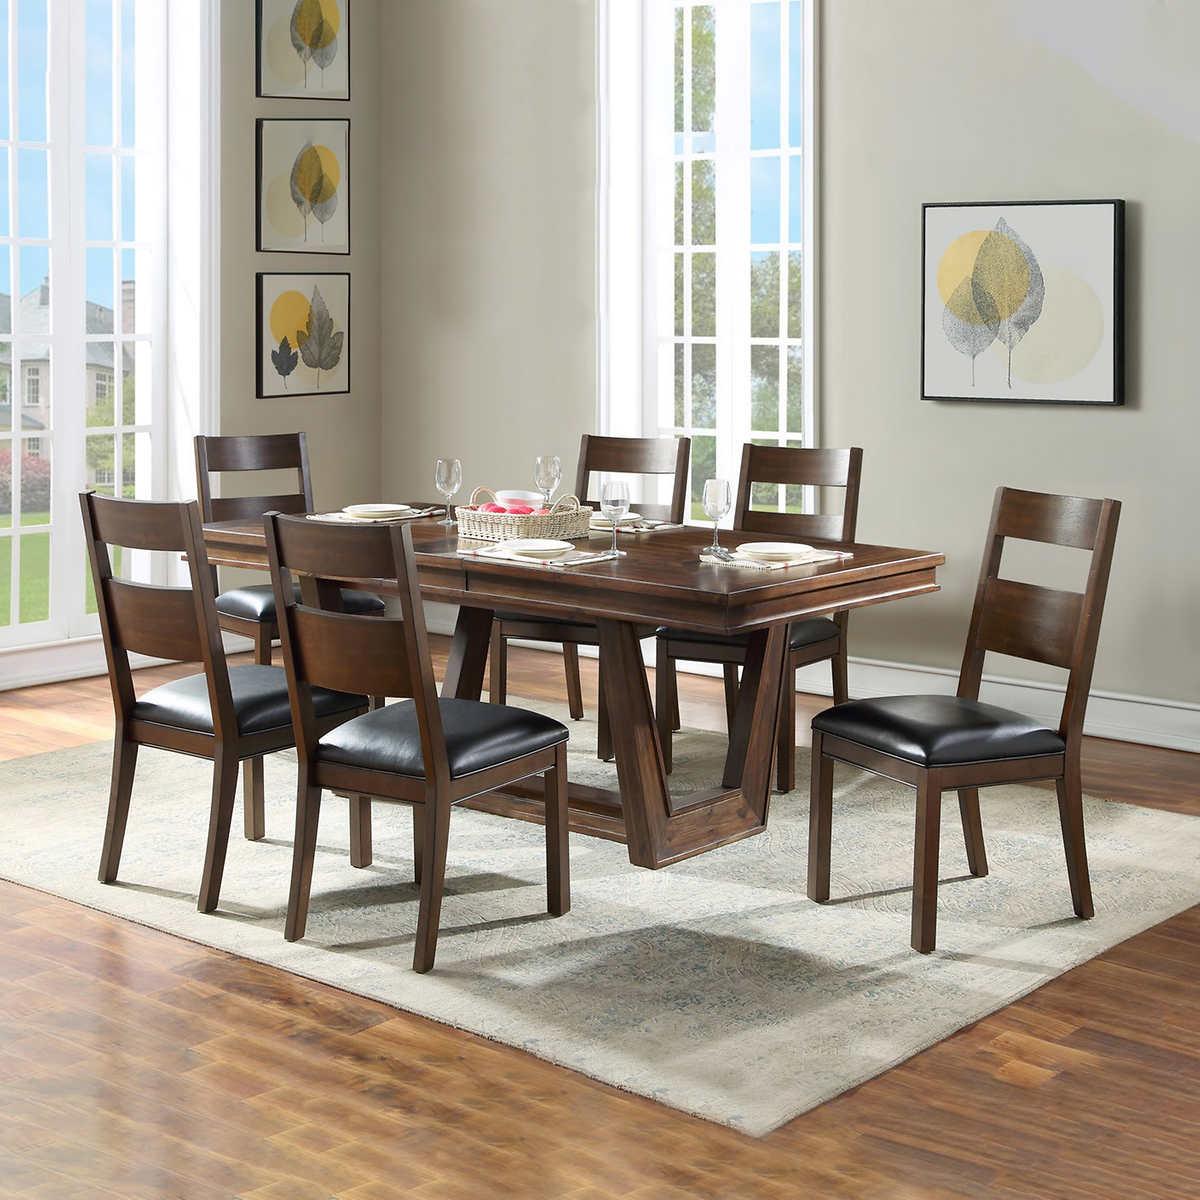 Pierce 9 piece Modern Dining Room Set